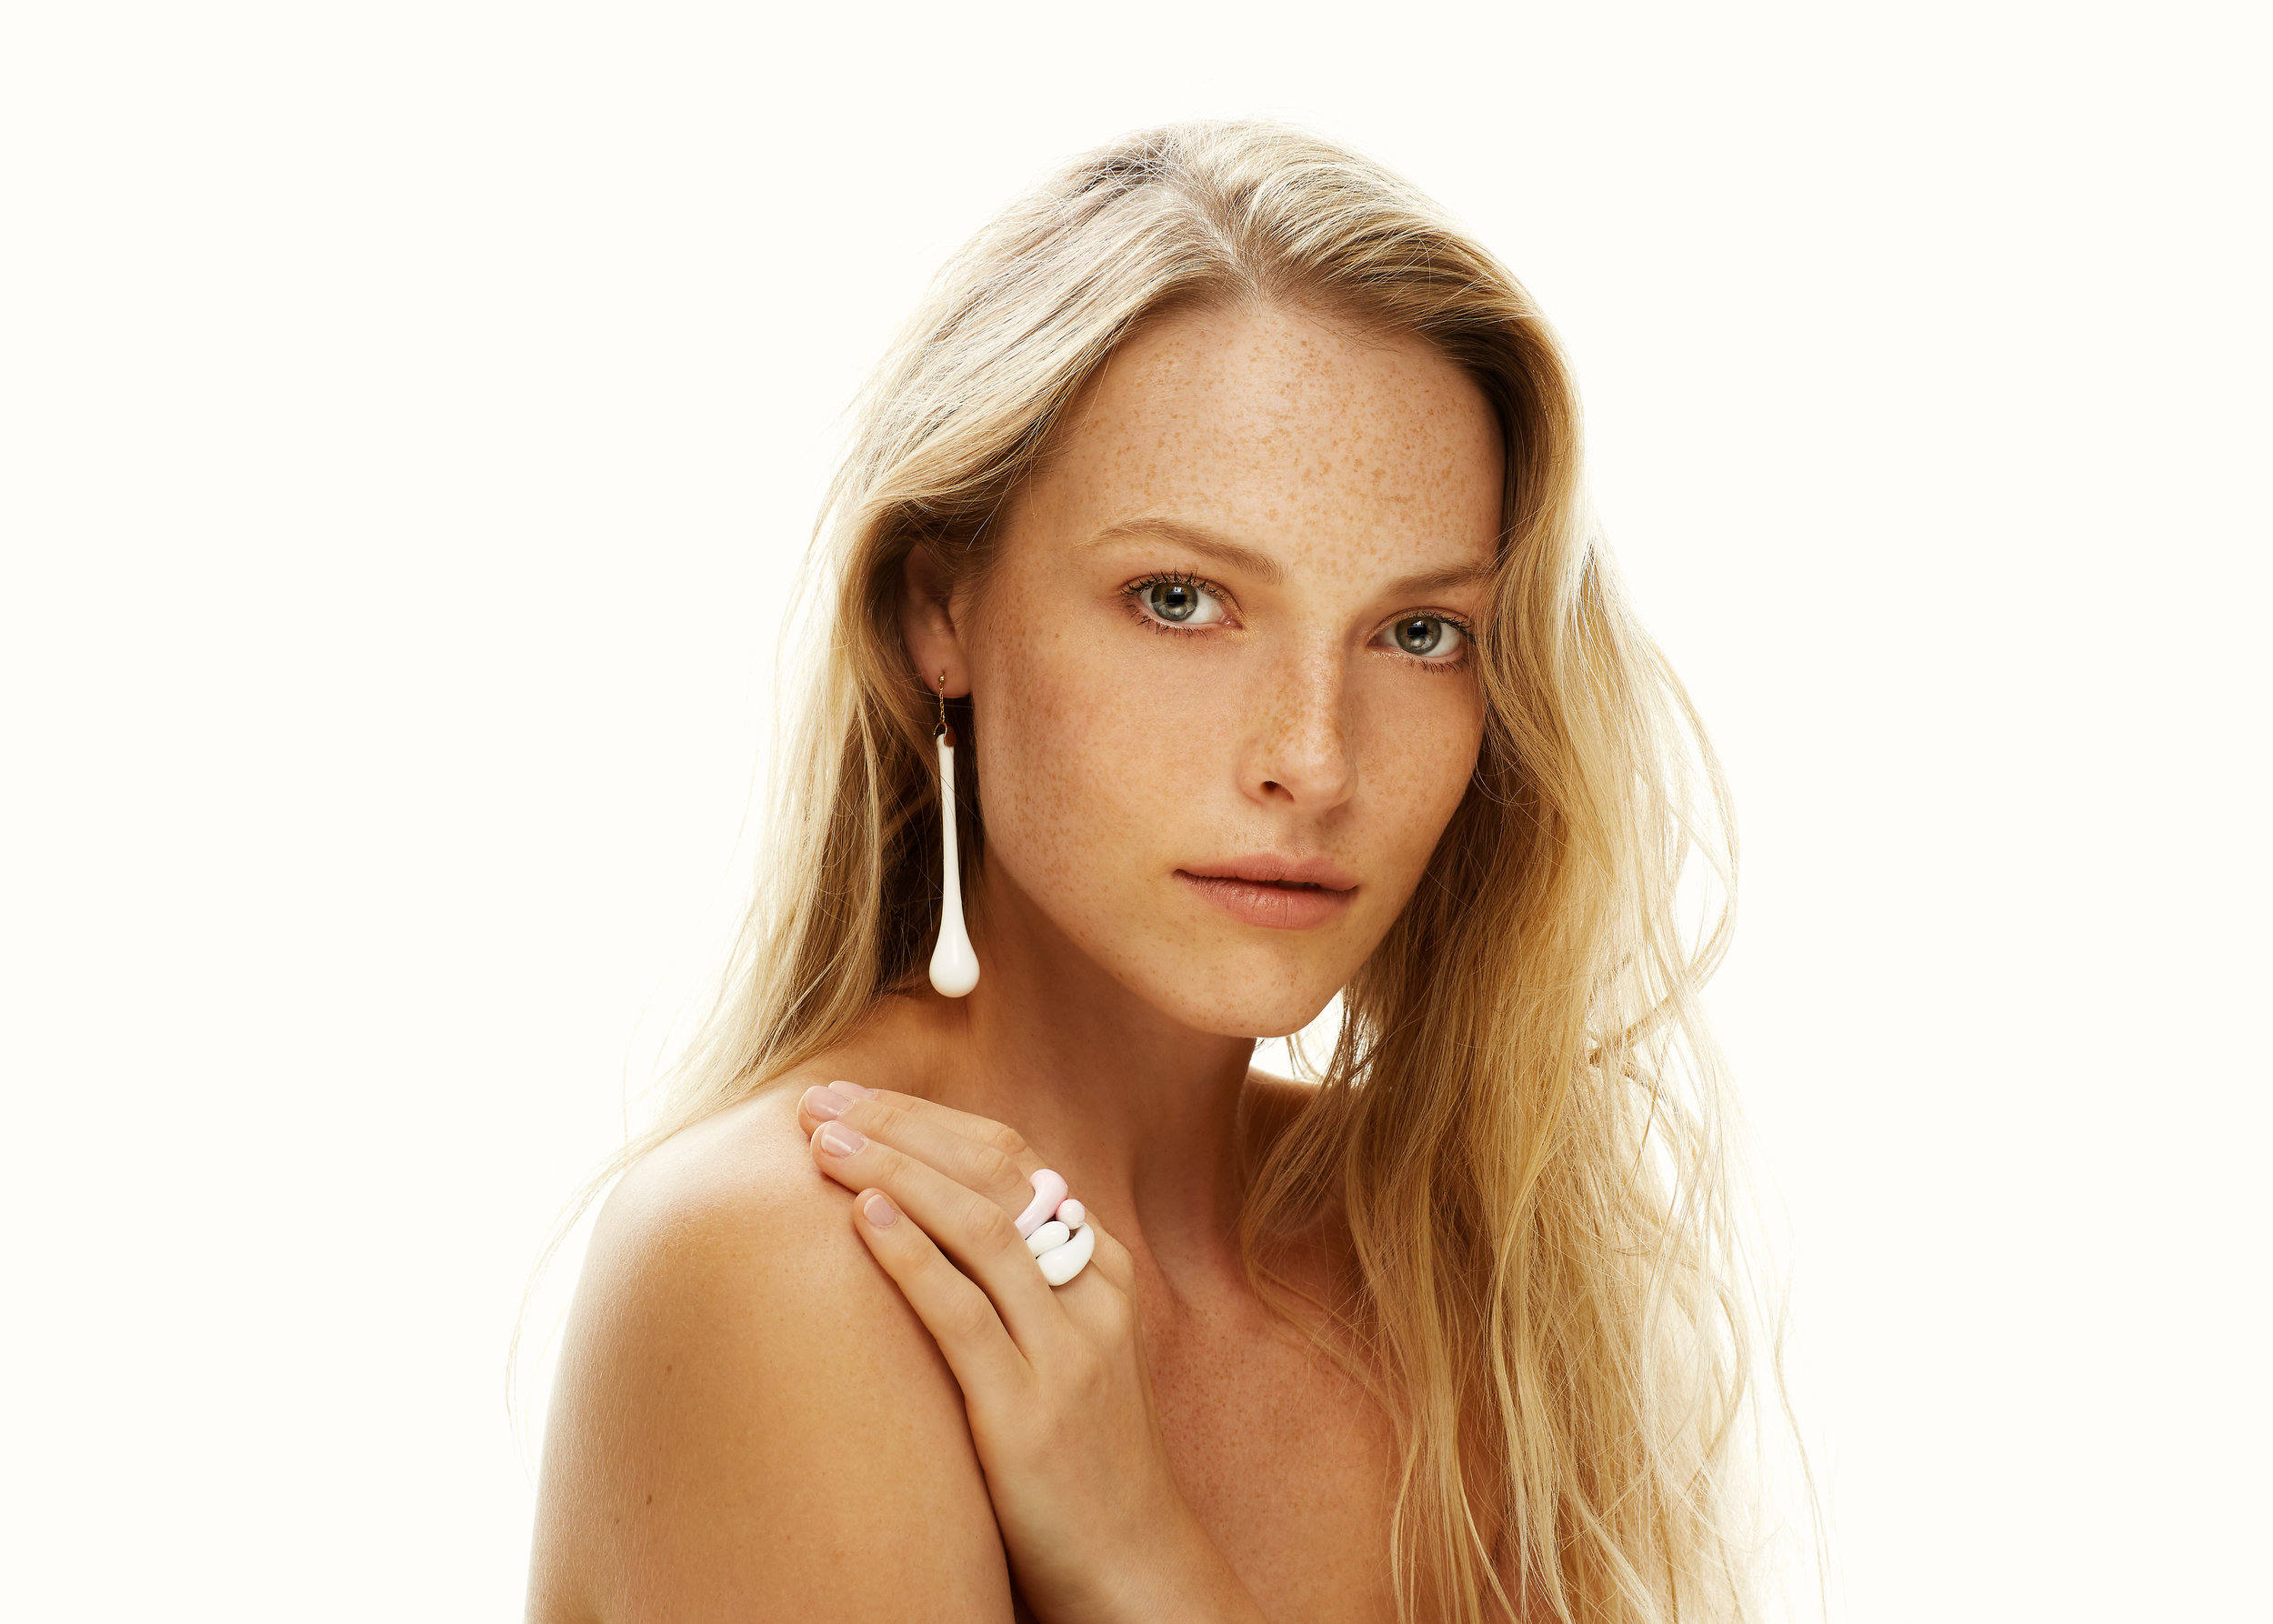 Polina_for_Julia_Altshuler_Jewelry_1.jpg